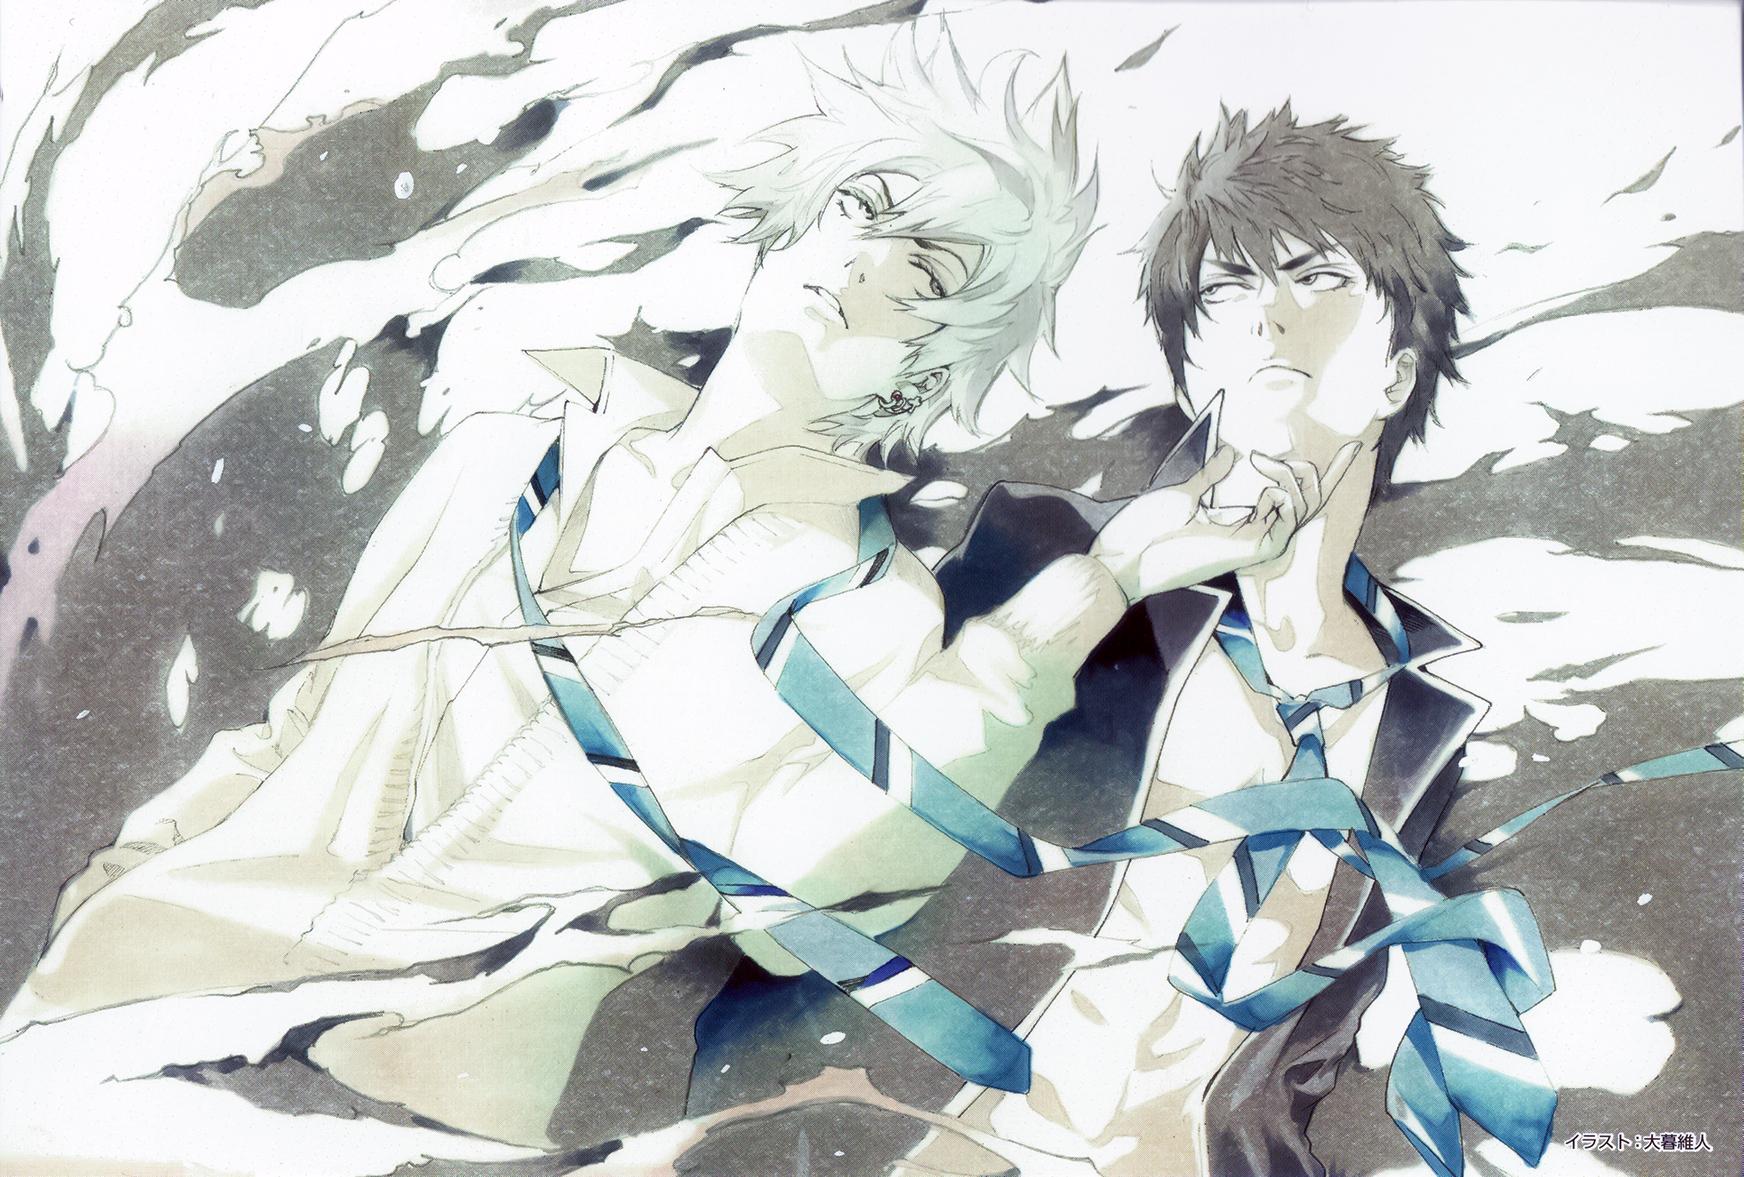 Yamada Ryuu Yamada Kun To 7 Nin No Majo Zerochan Anime Image Board